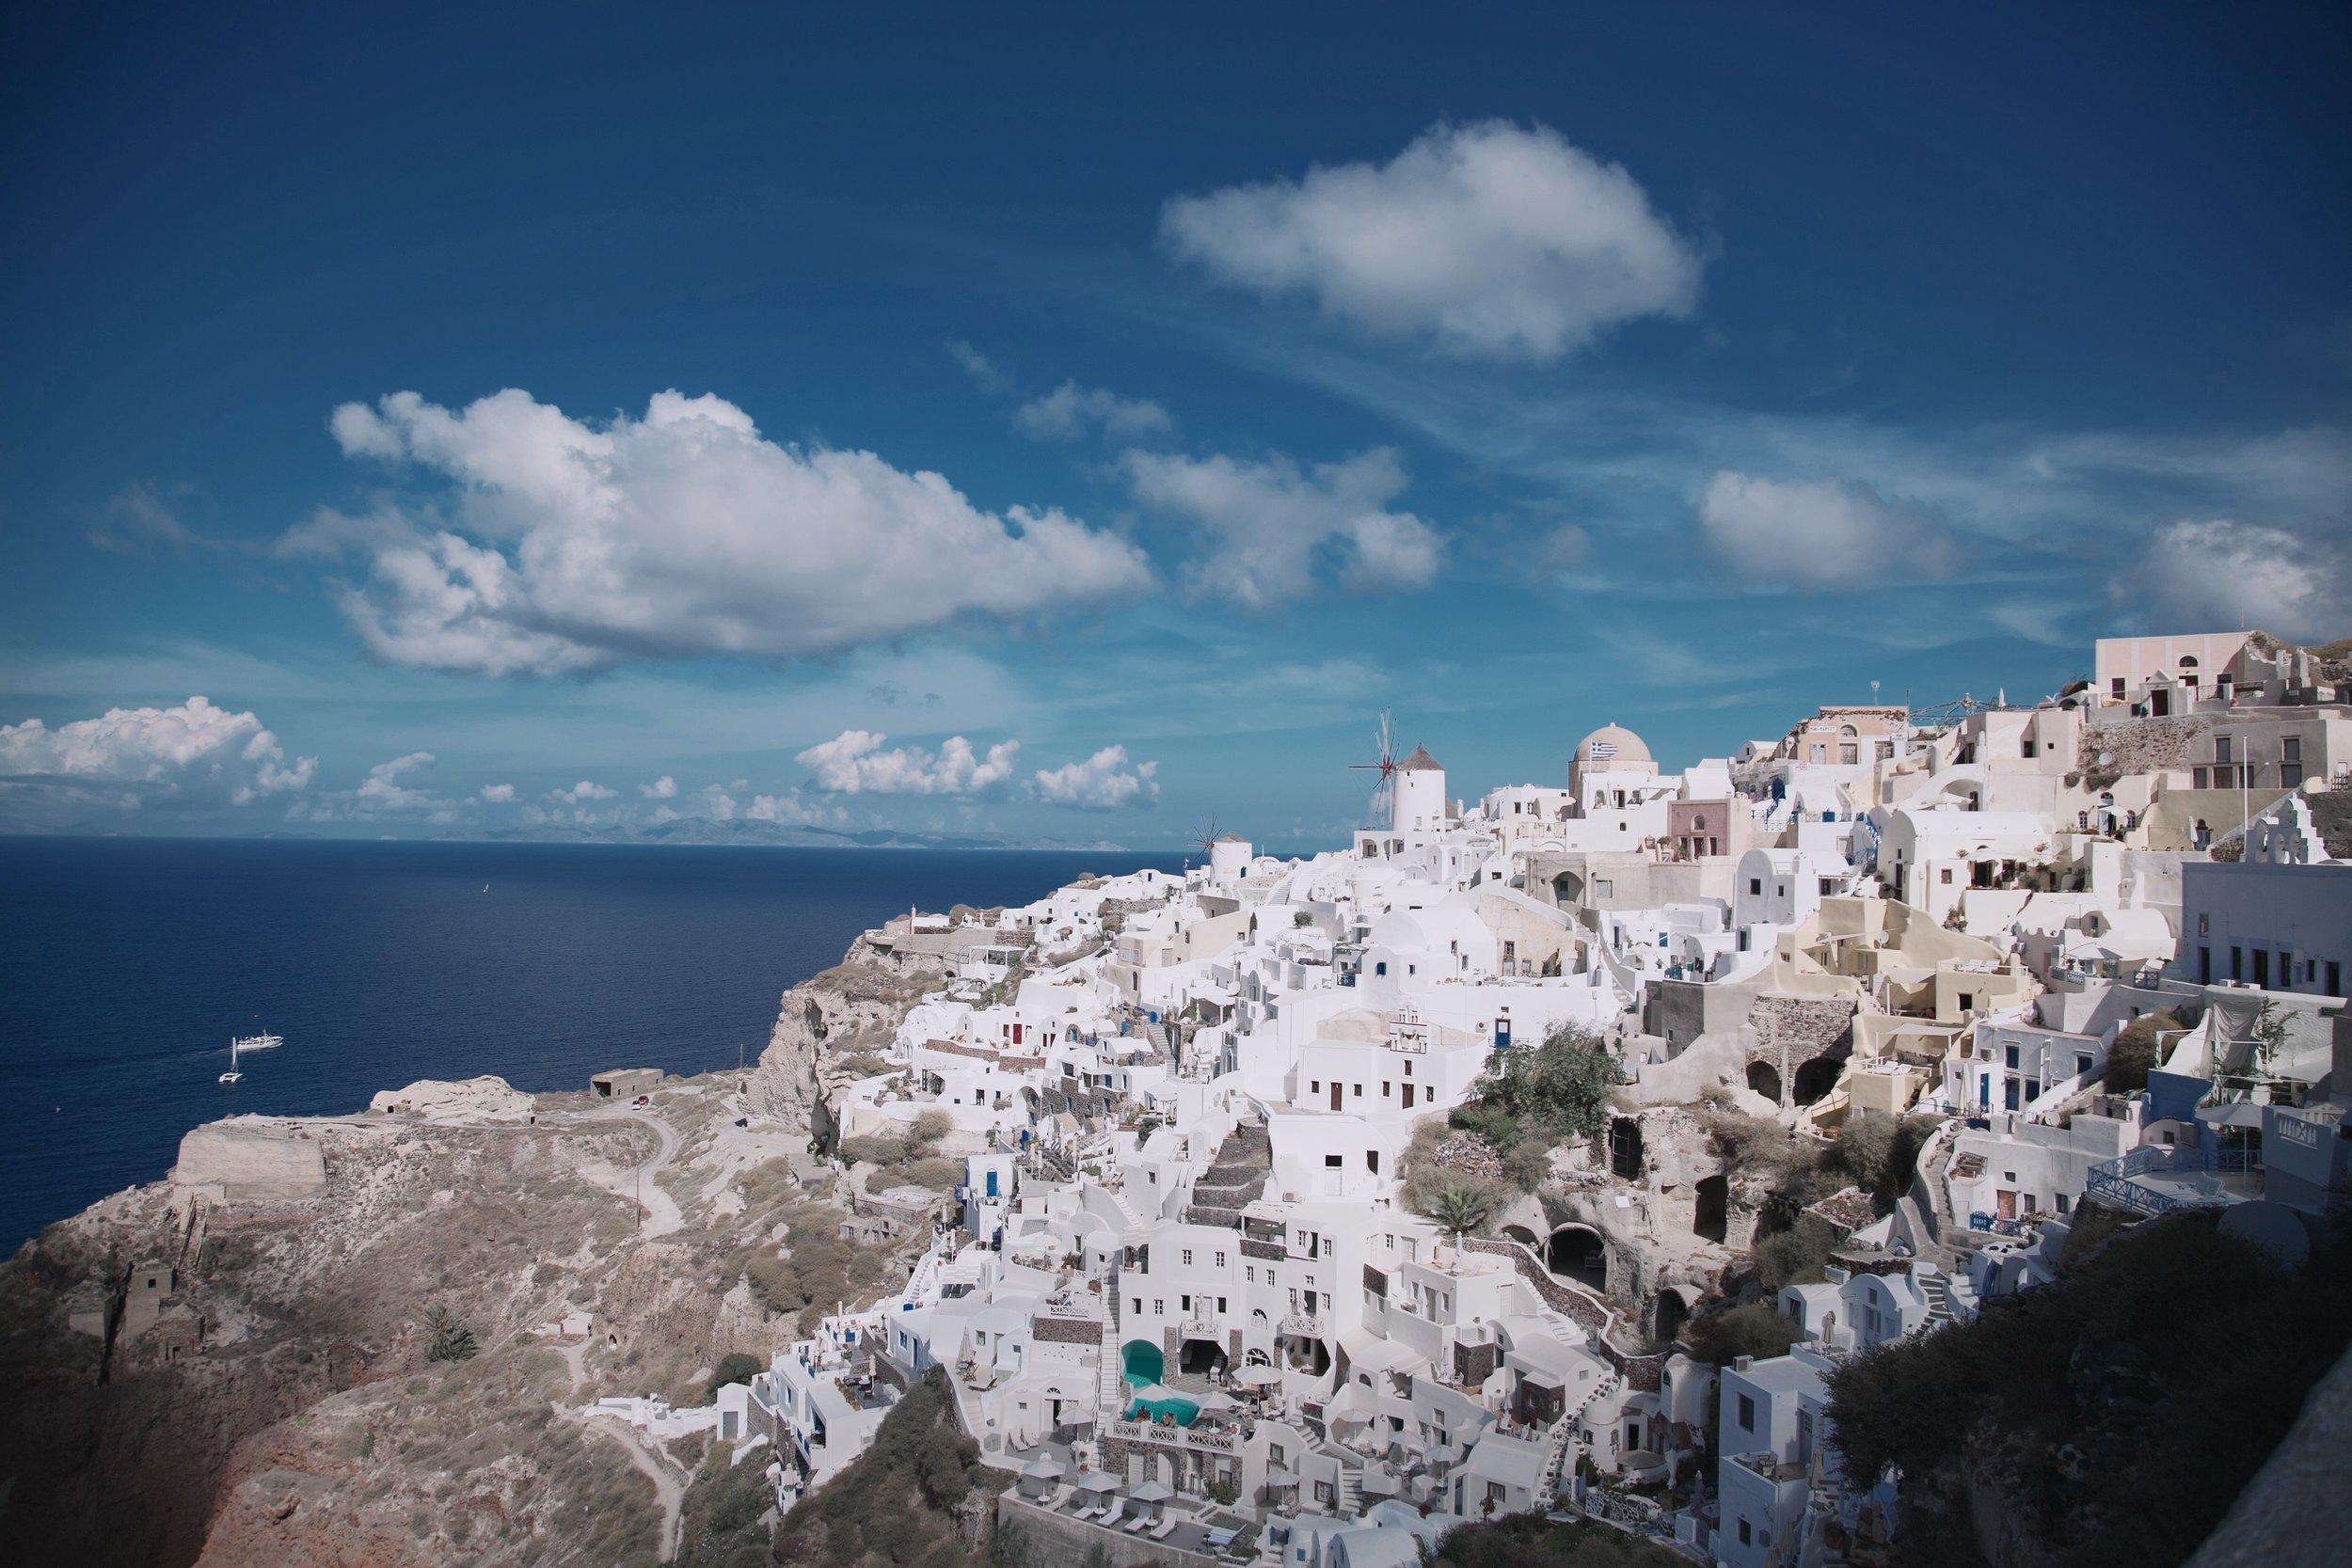 Santorini, Greece: photo by Executive Thrillseekers